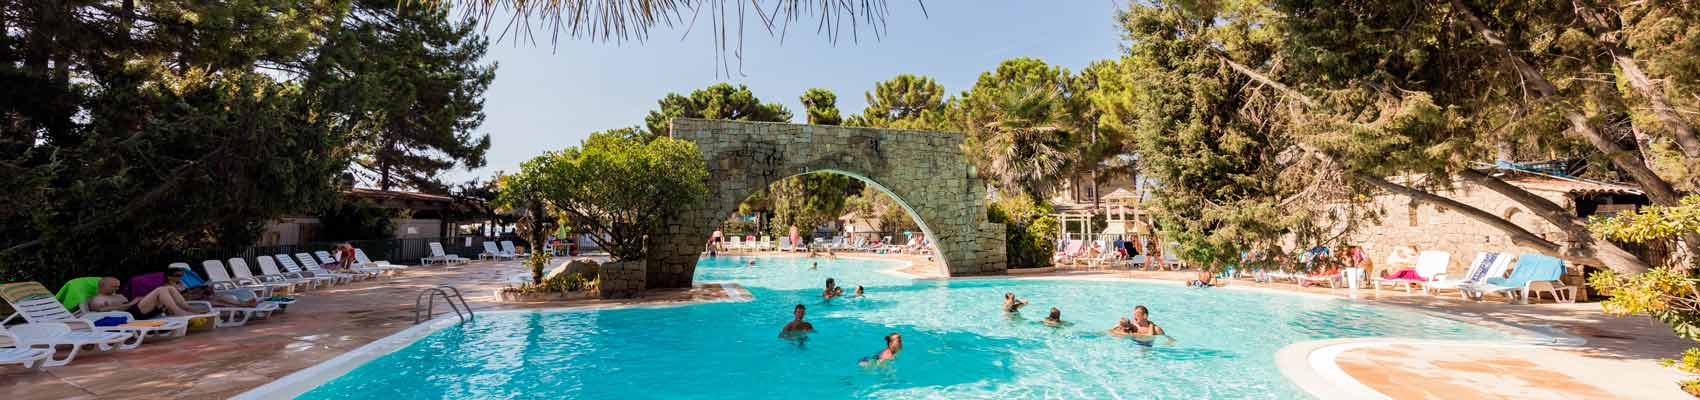 Camping 4 étoiles avec piscine Corse